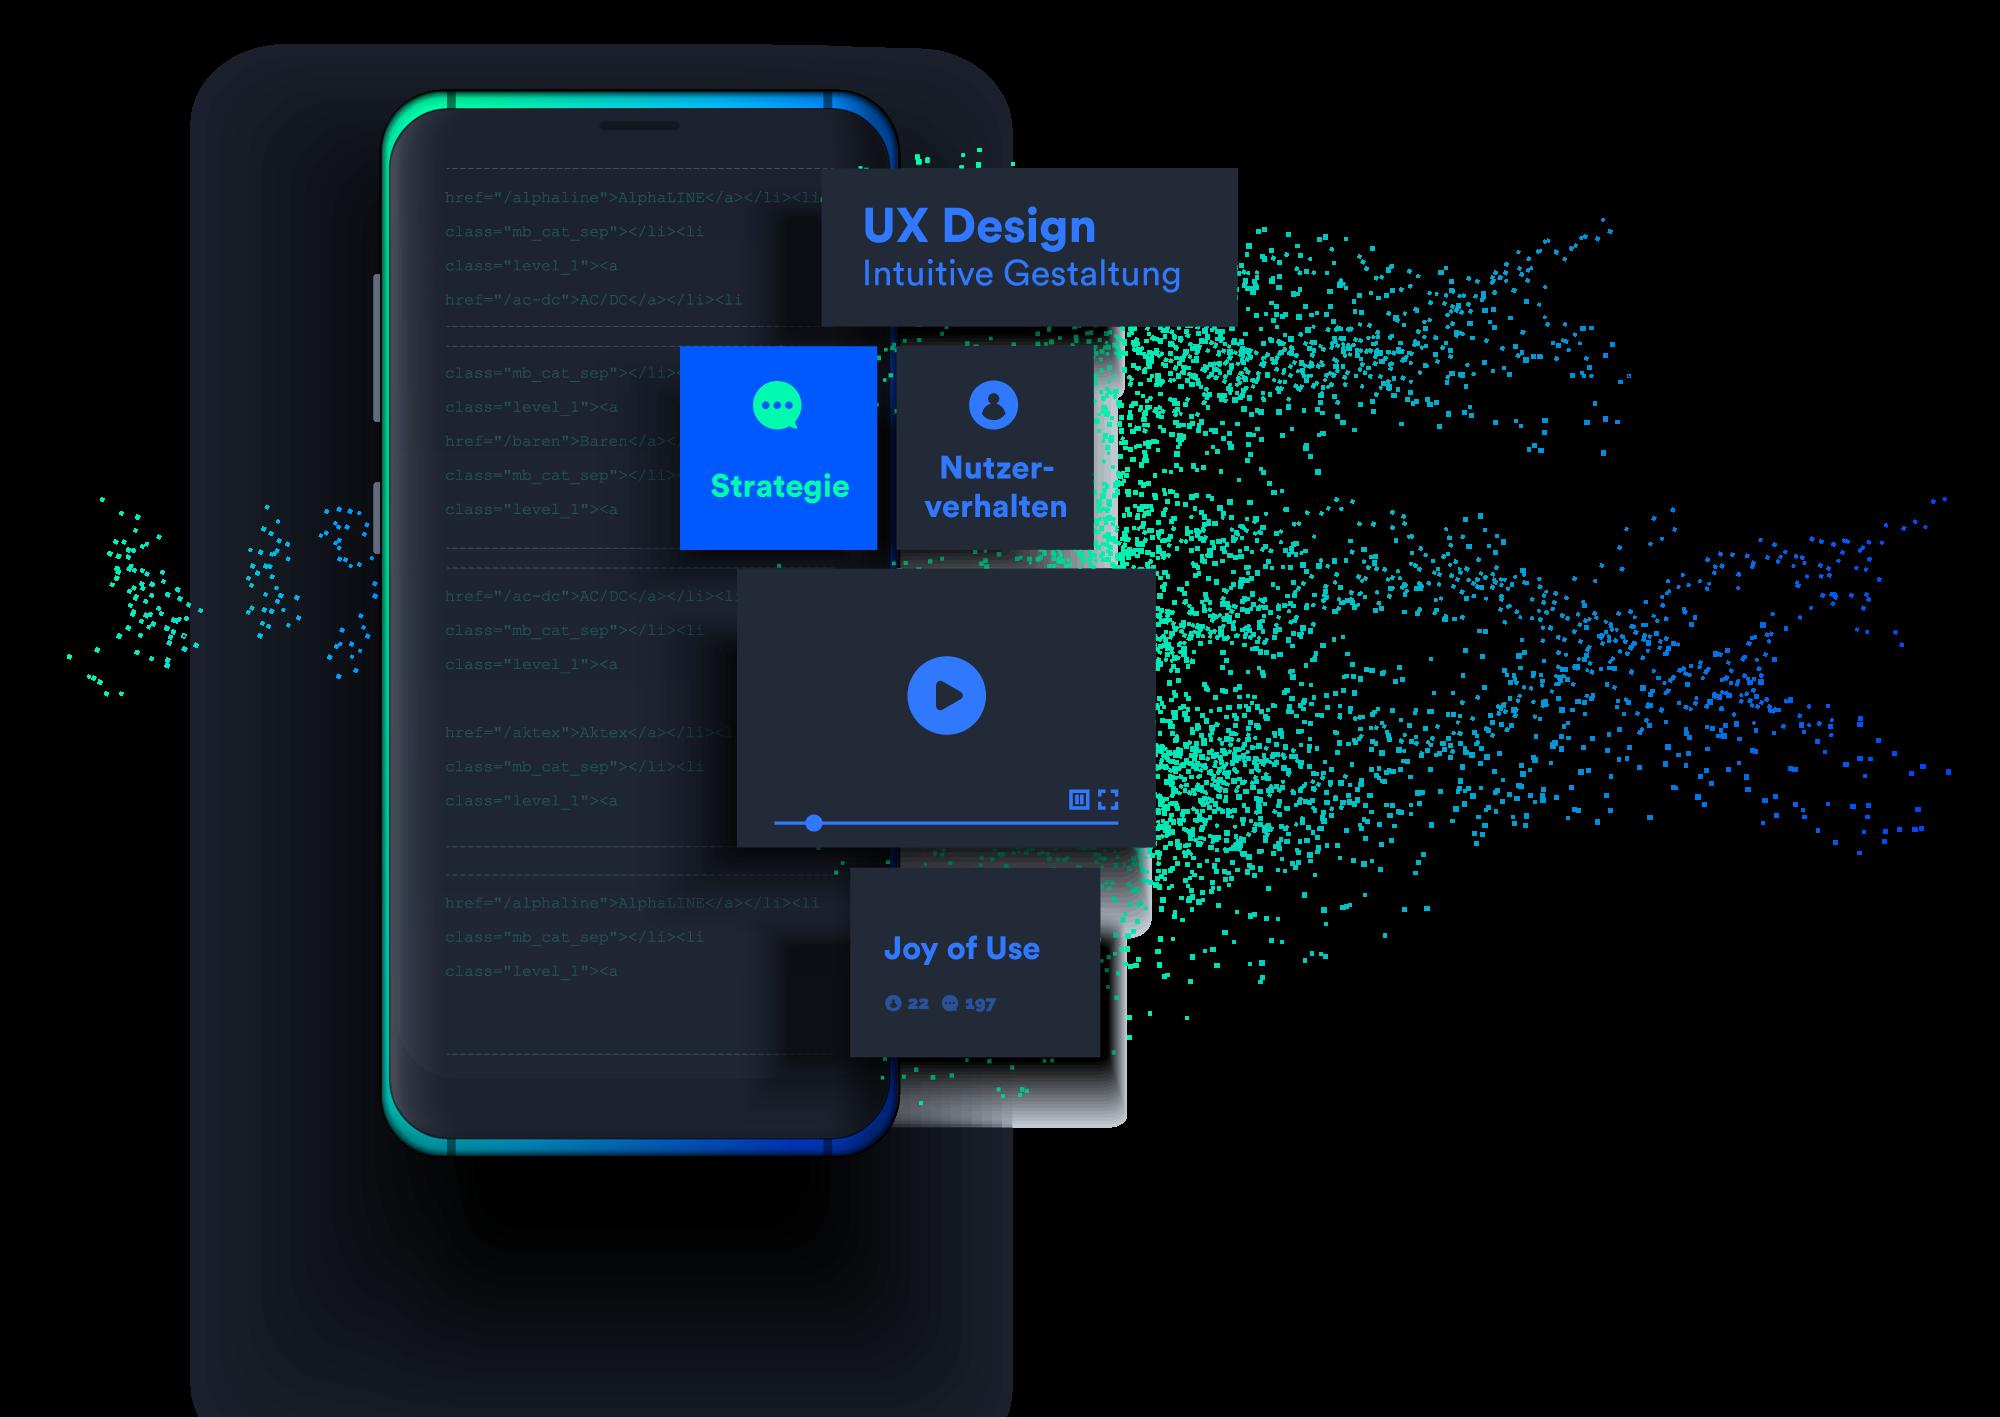 Kopfmedia Werbeagentur Offenburg - IT / UI / UX - User Experience Design